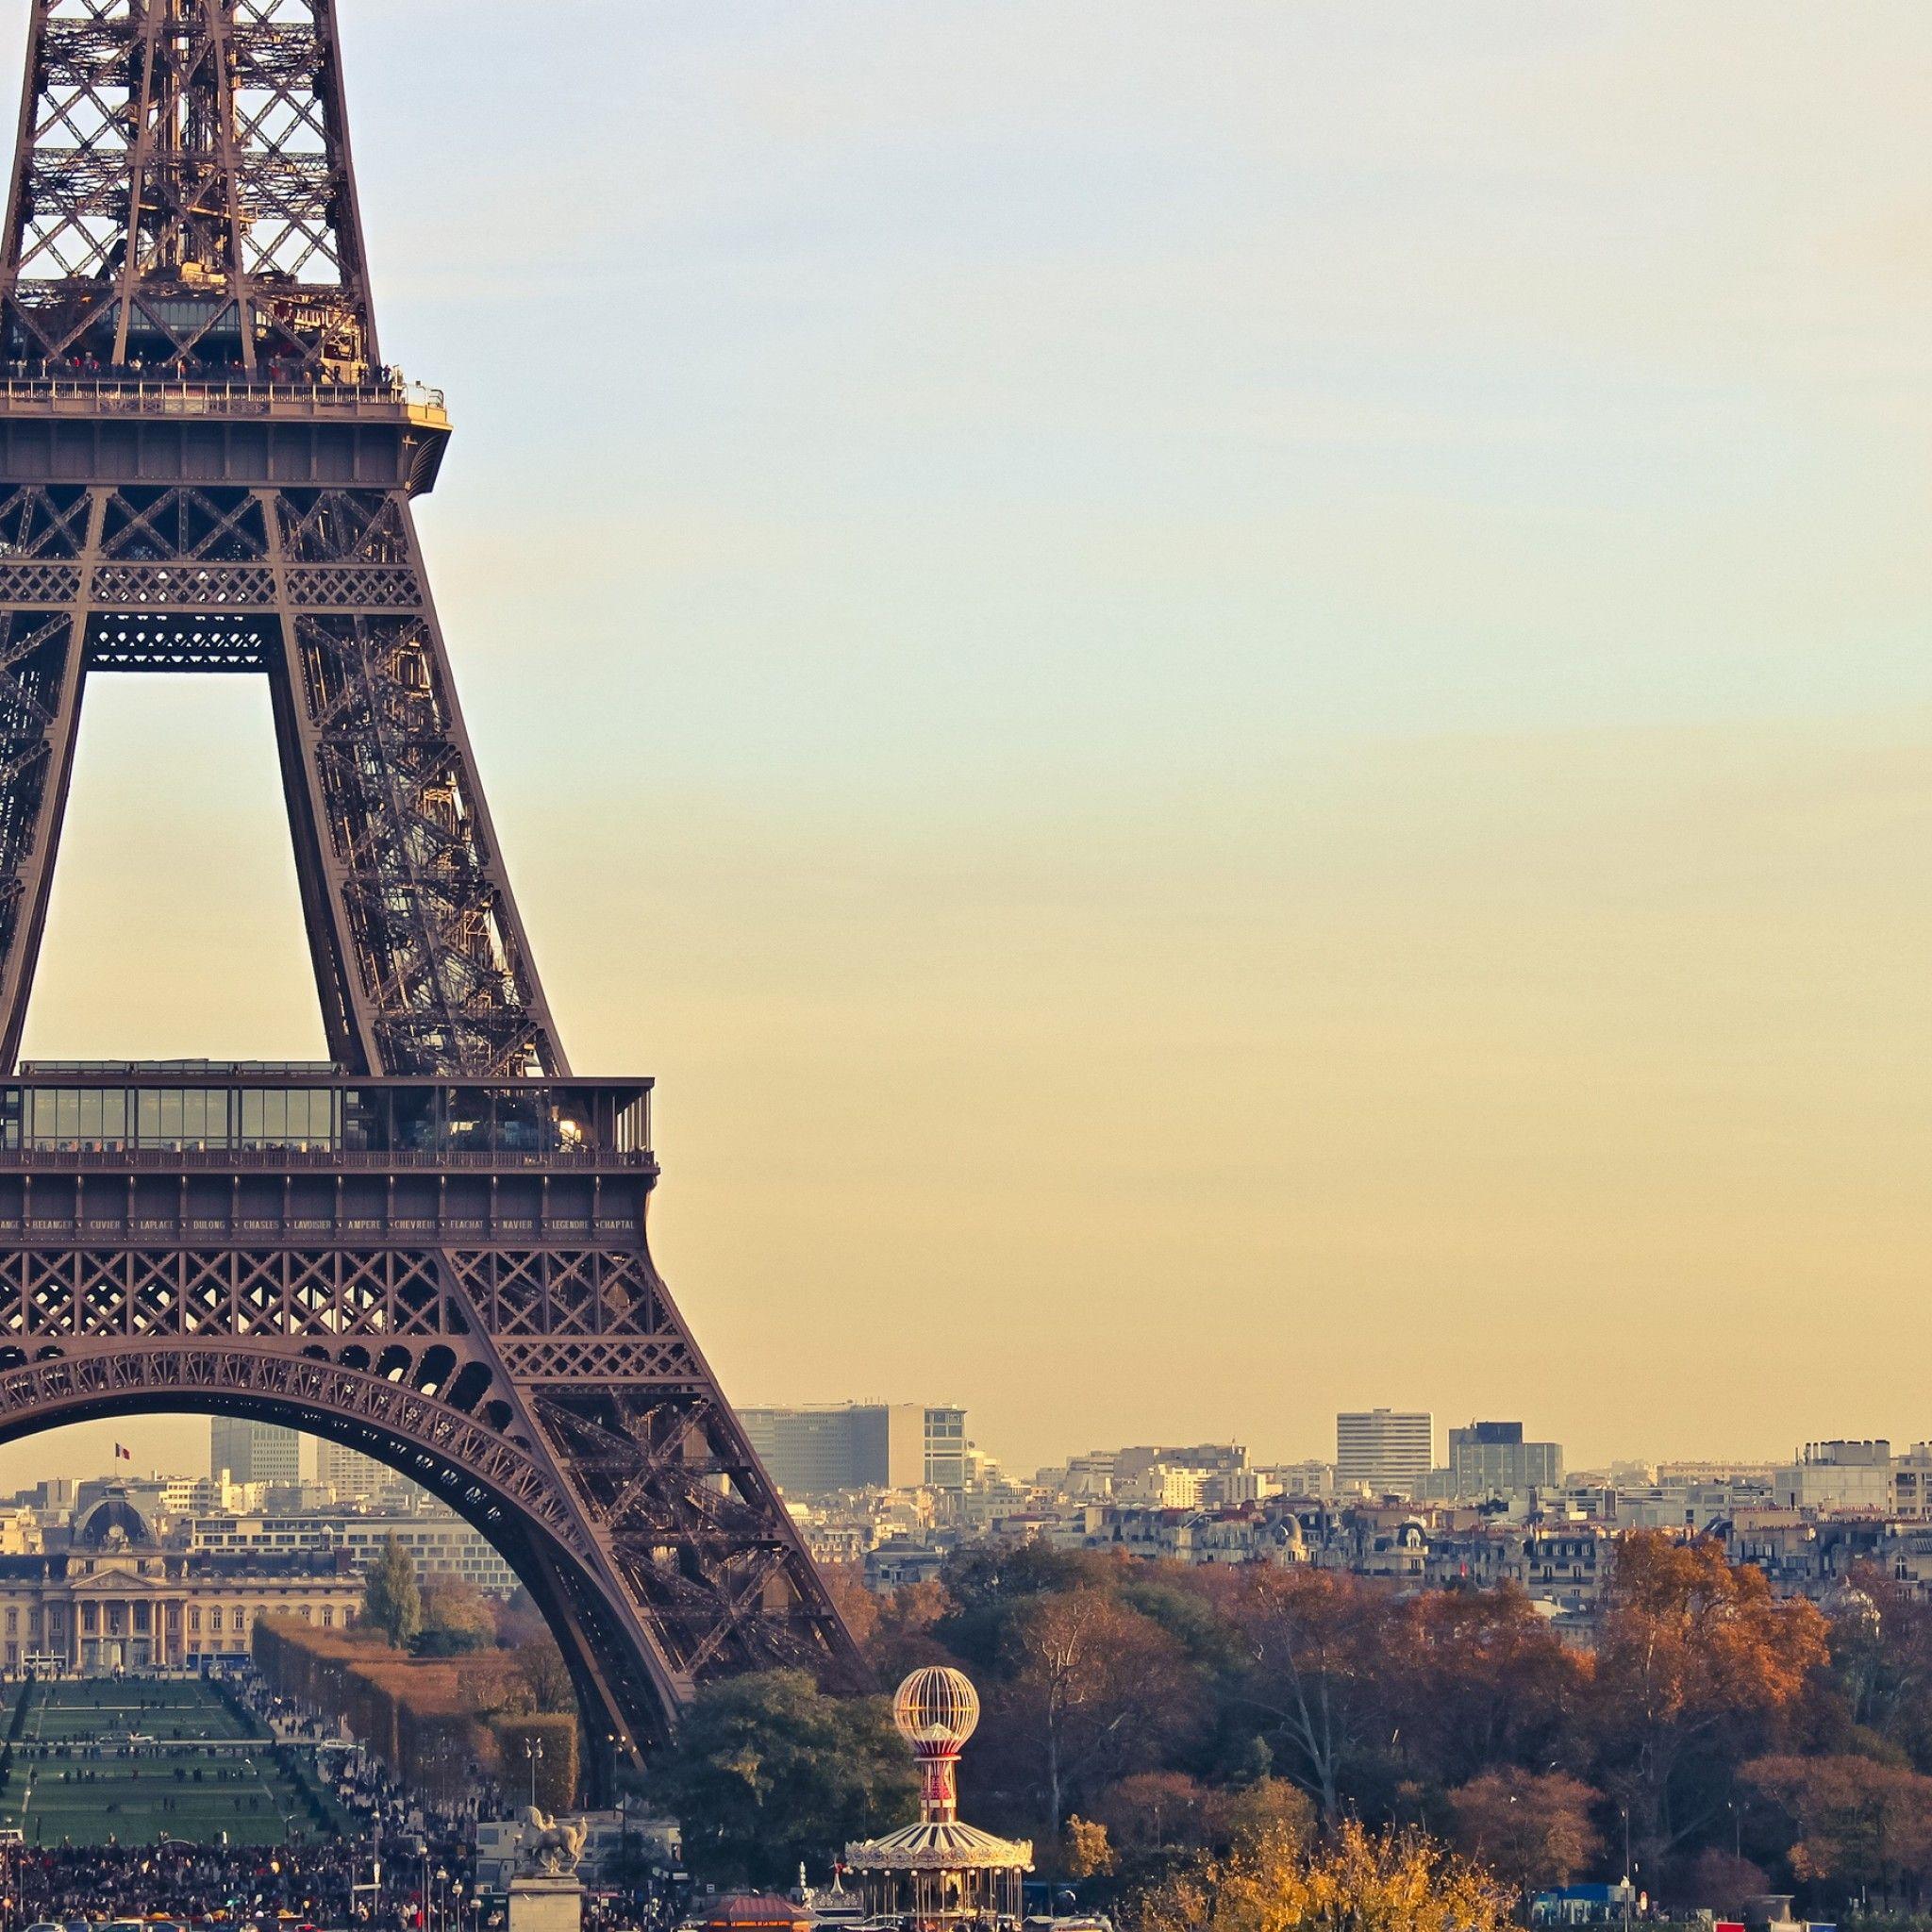 Iphone Wallpaper Paris Ipad Wallpaper Gallery パリ 映画 エッフェル塔 行ってみたい場所